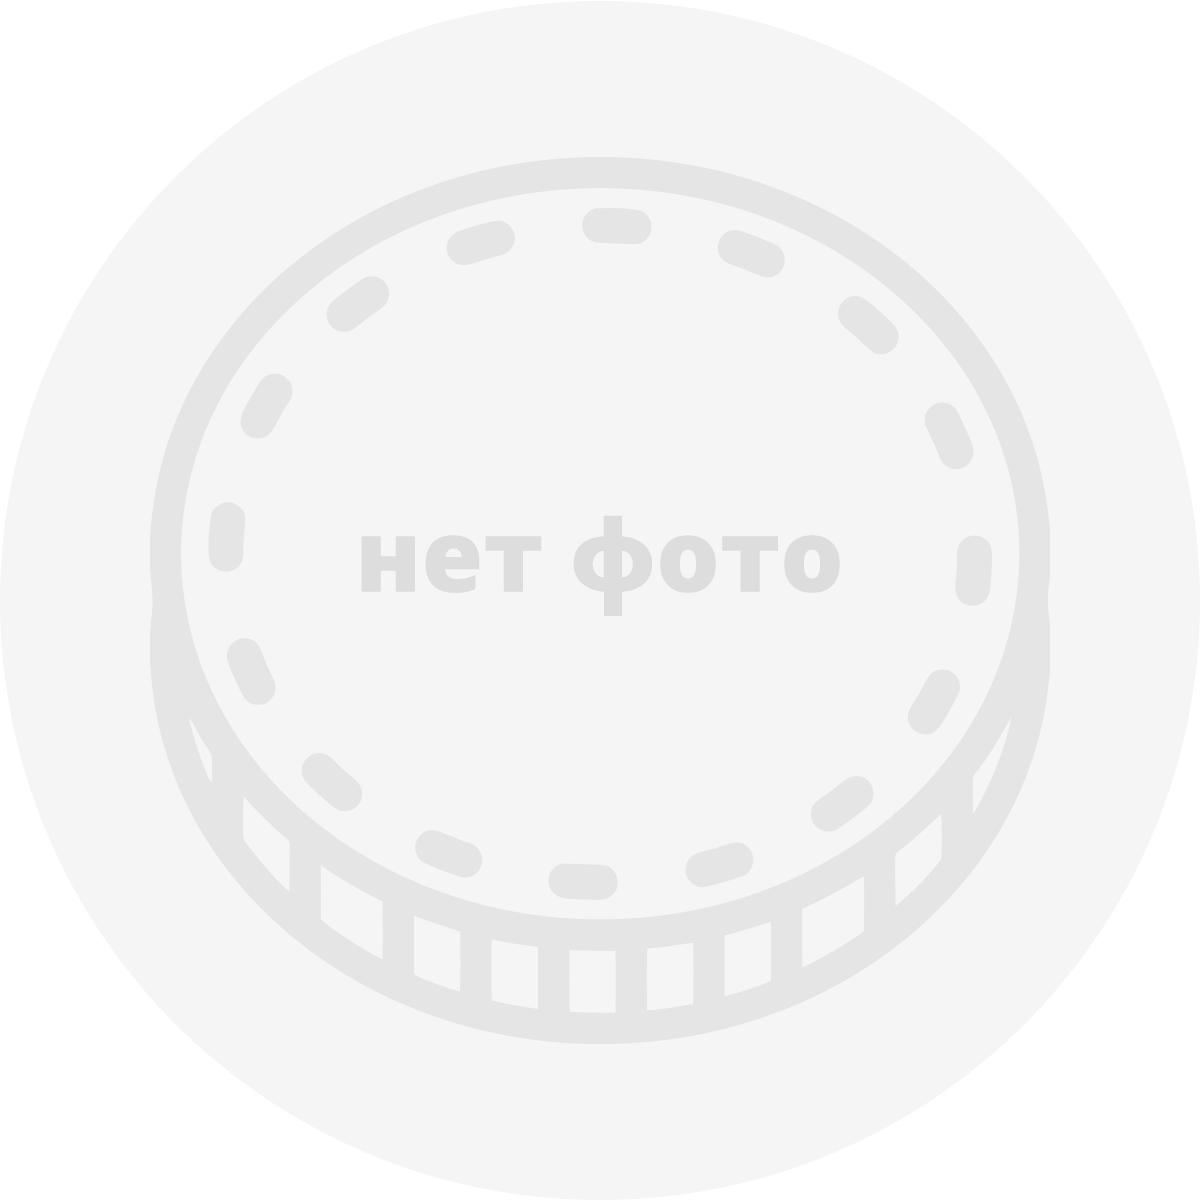 Антильские острова, 2 1/2 цента (1980 г.)